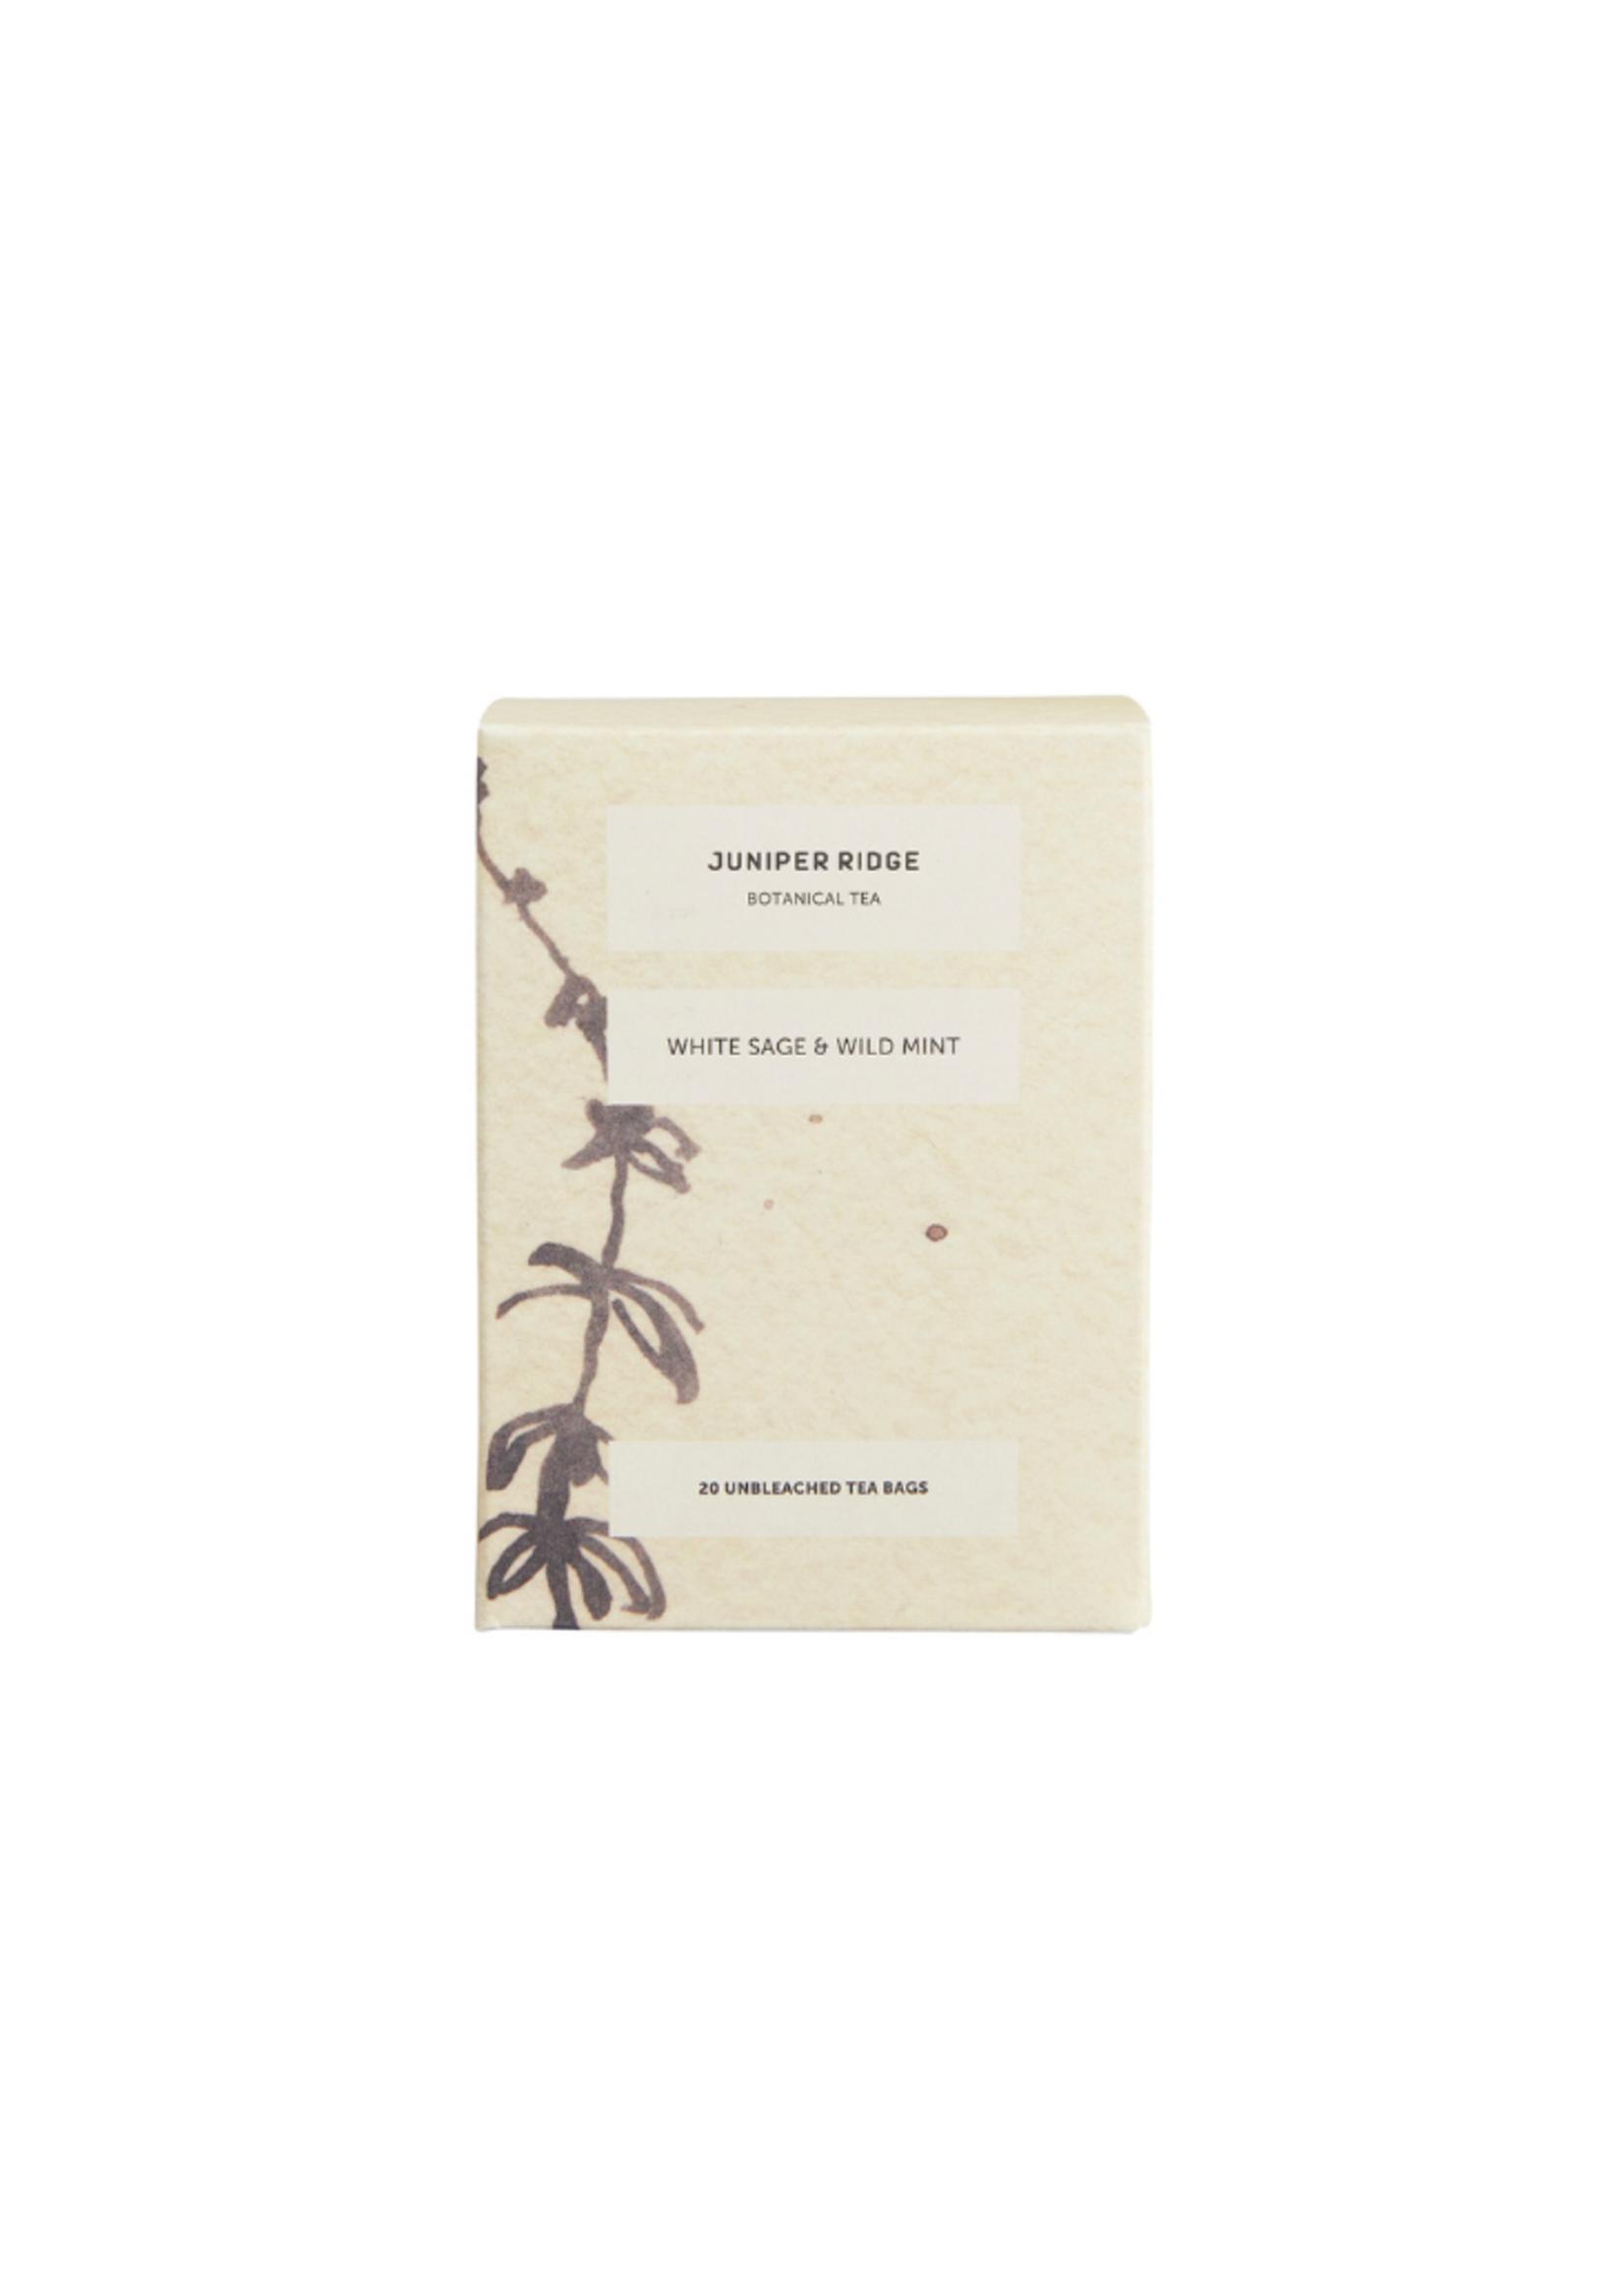 Juniper Ridge White Sage & Wild Mint Botanical Tea